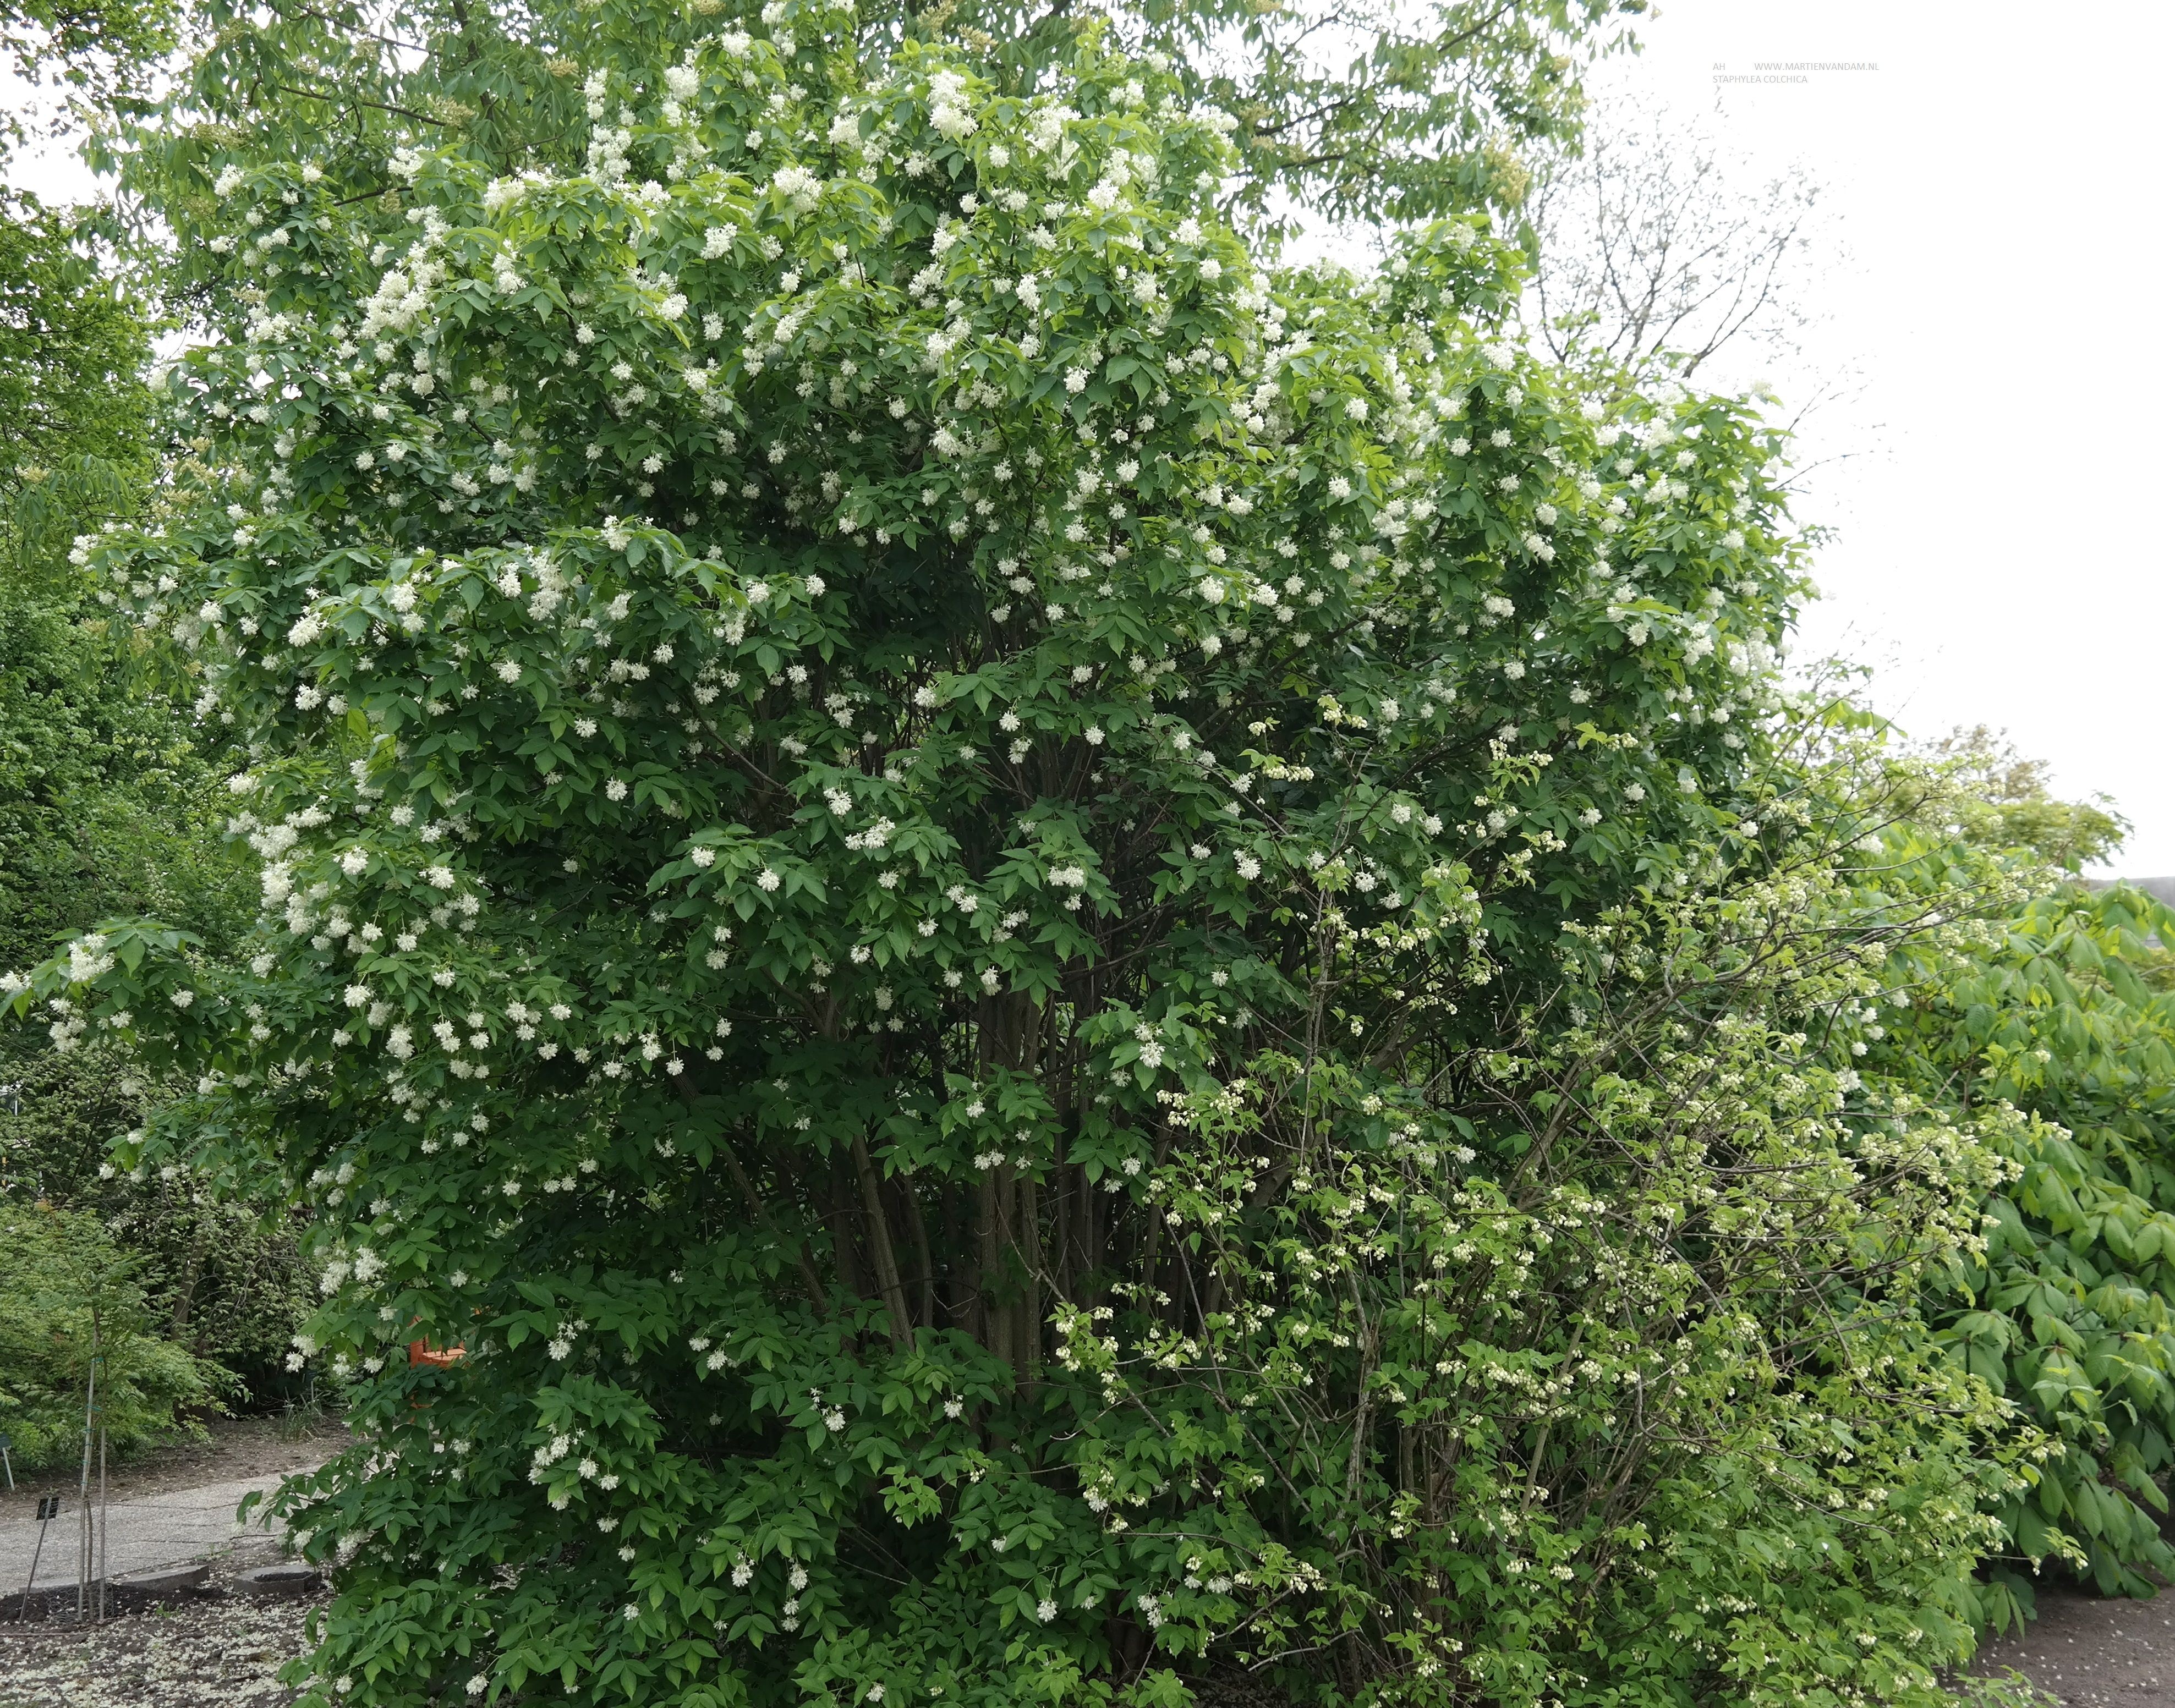 beautiful staphylea colchica u kaukasische pimpernoot grote struik of kleine boom met groene. Black Bedroom Furniture Sets. Home Design Ideas